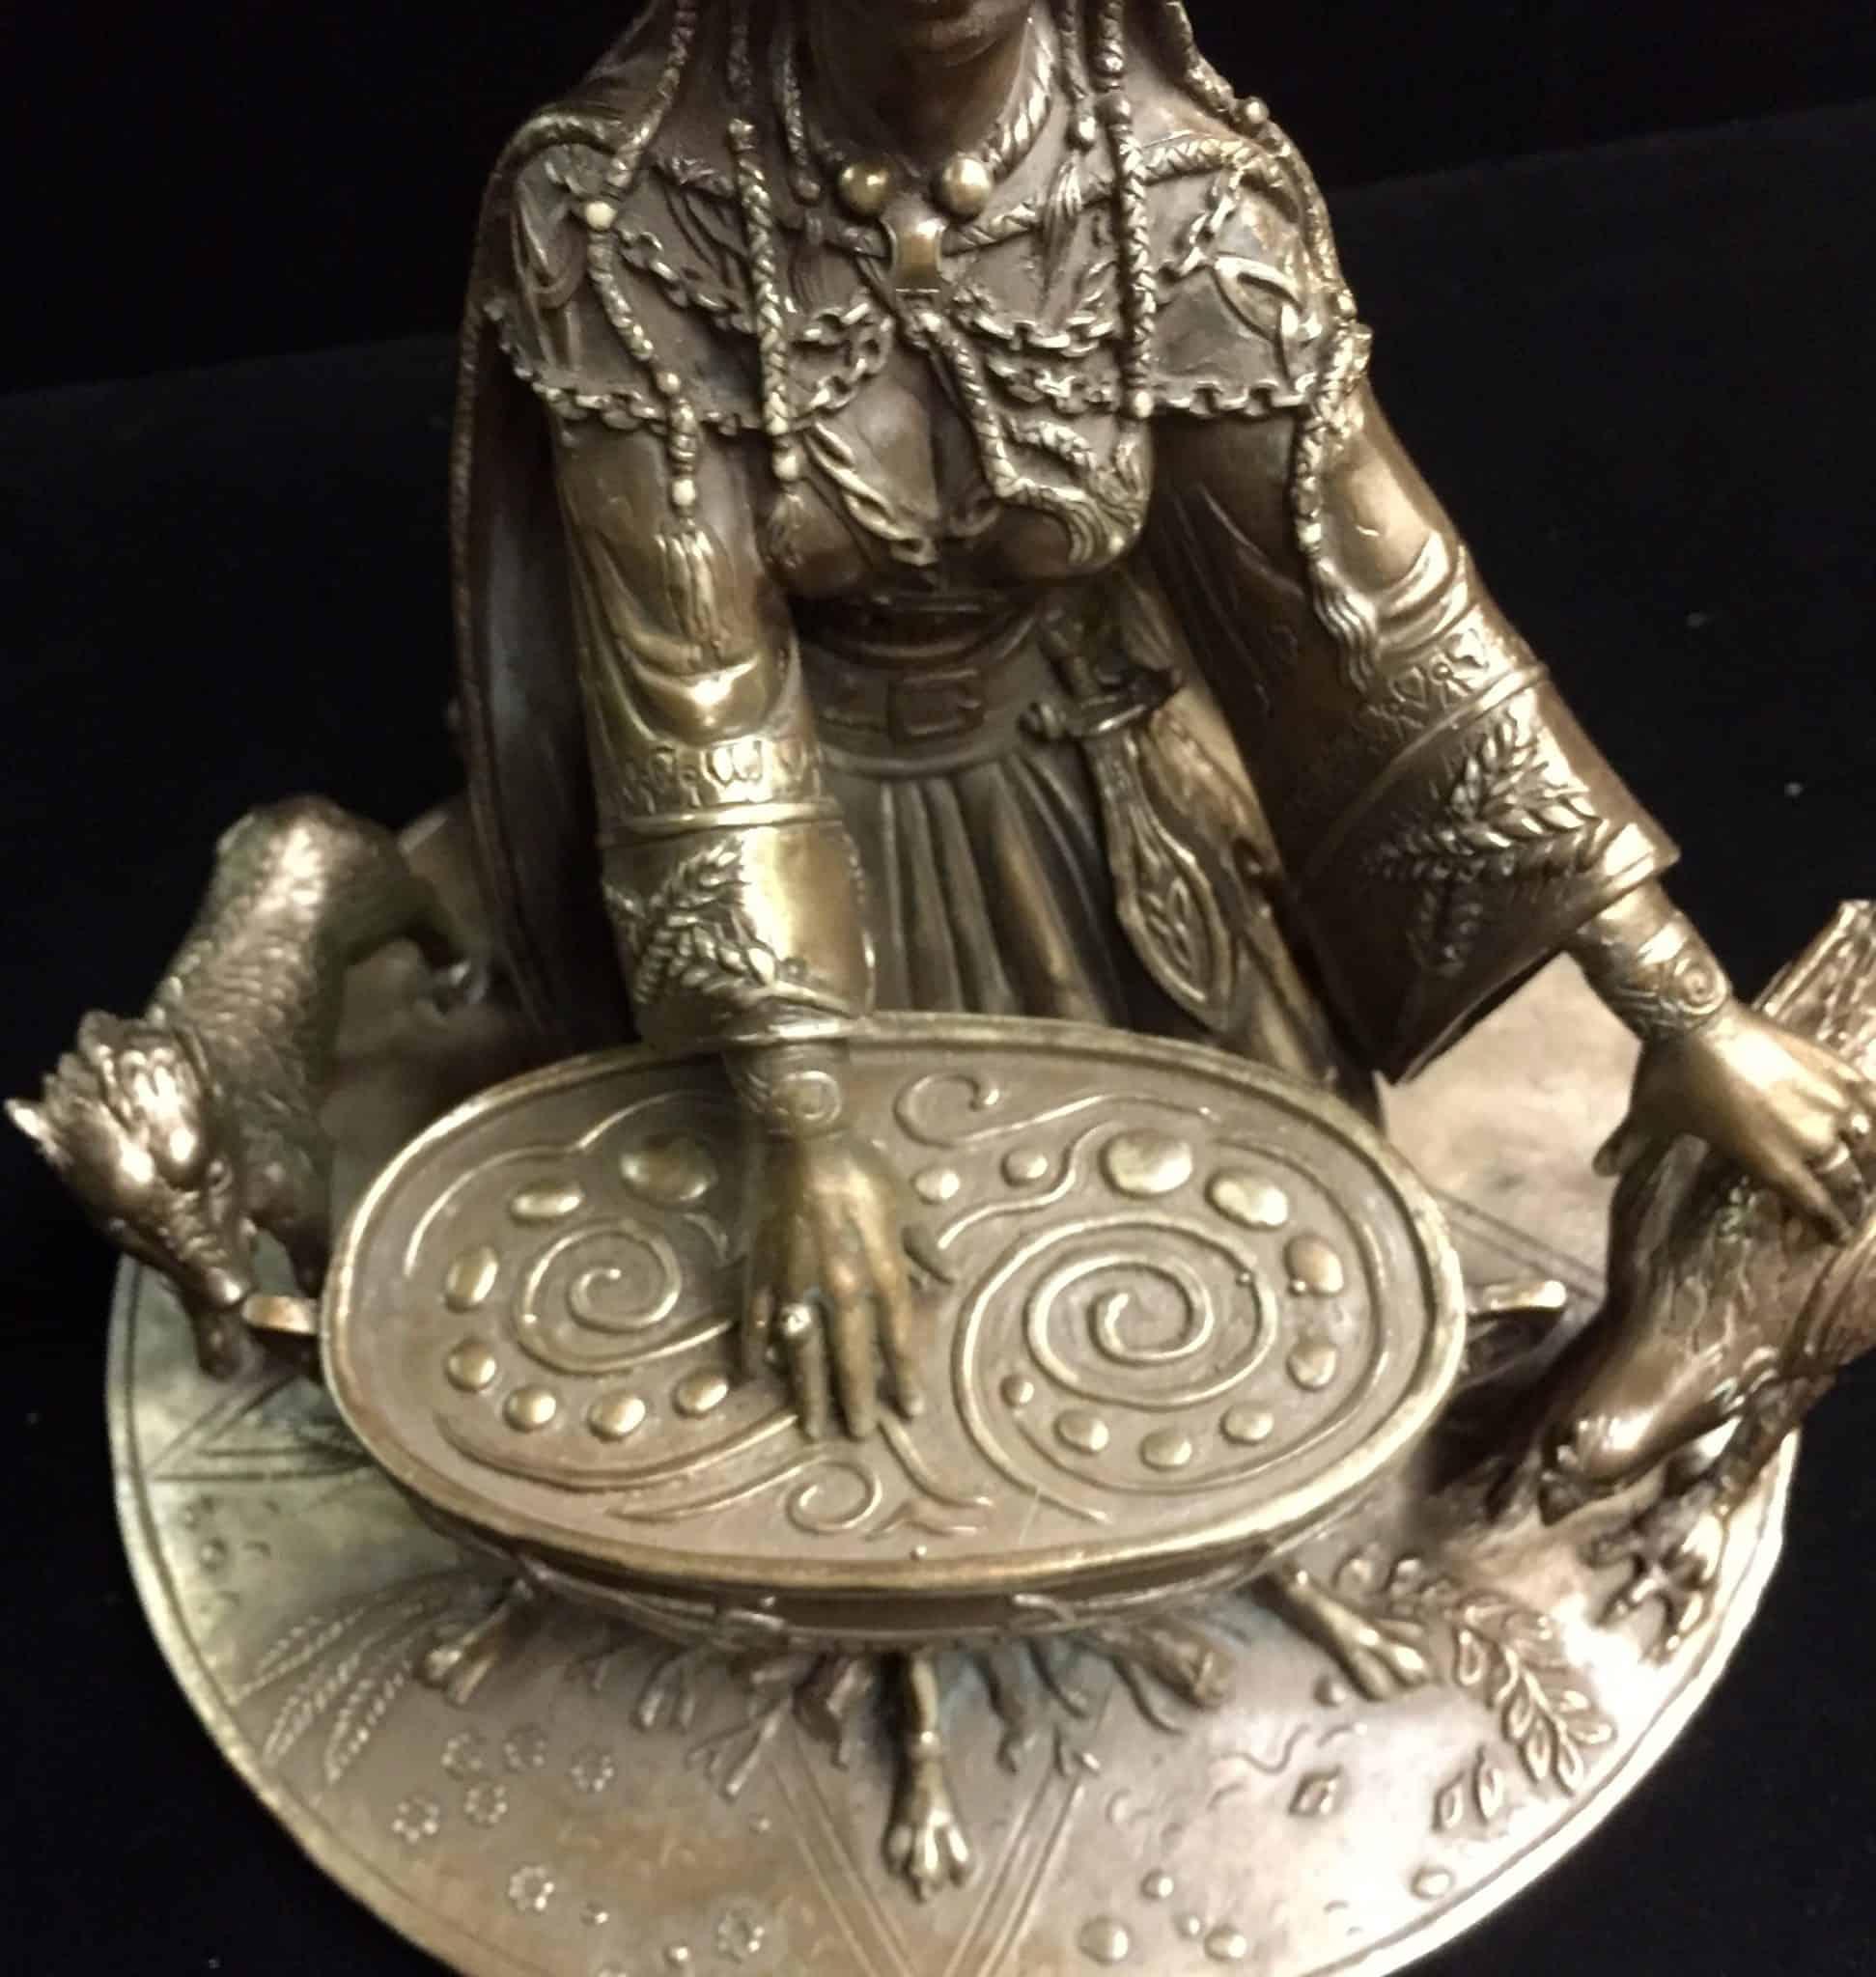 Celtic Crone Goddess Cerridwen Cold Cast Bronze Statue by Maxine Miller ©Maxine Miller - Front View2